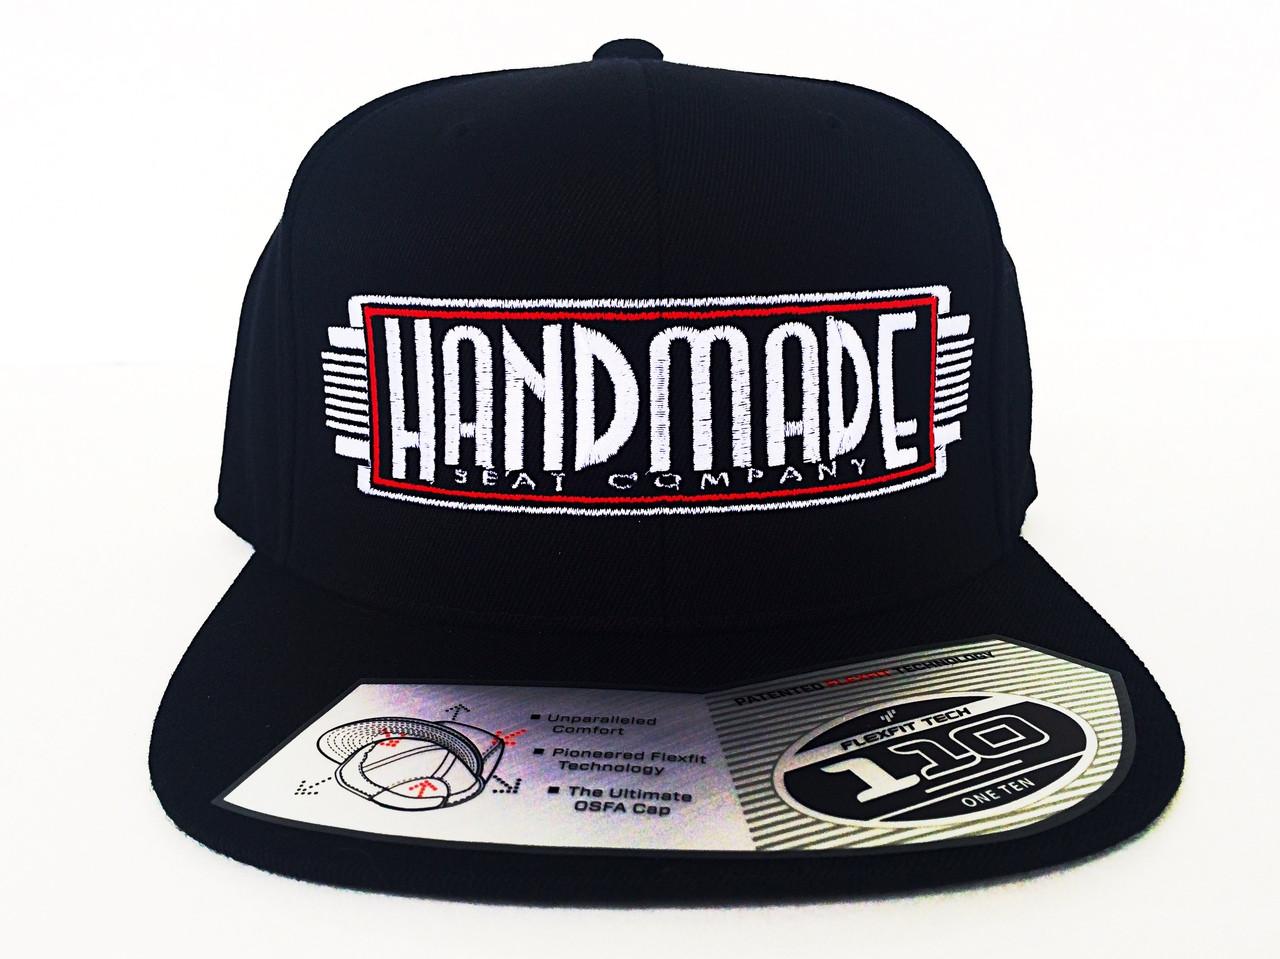 Handmade SnapBack Pro - Handmade Seat Co e33ff8e70a4